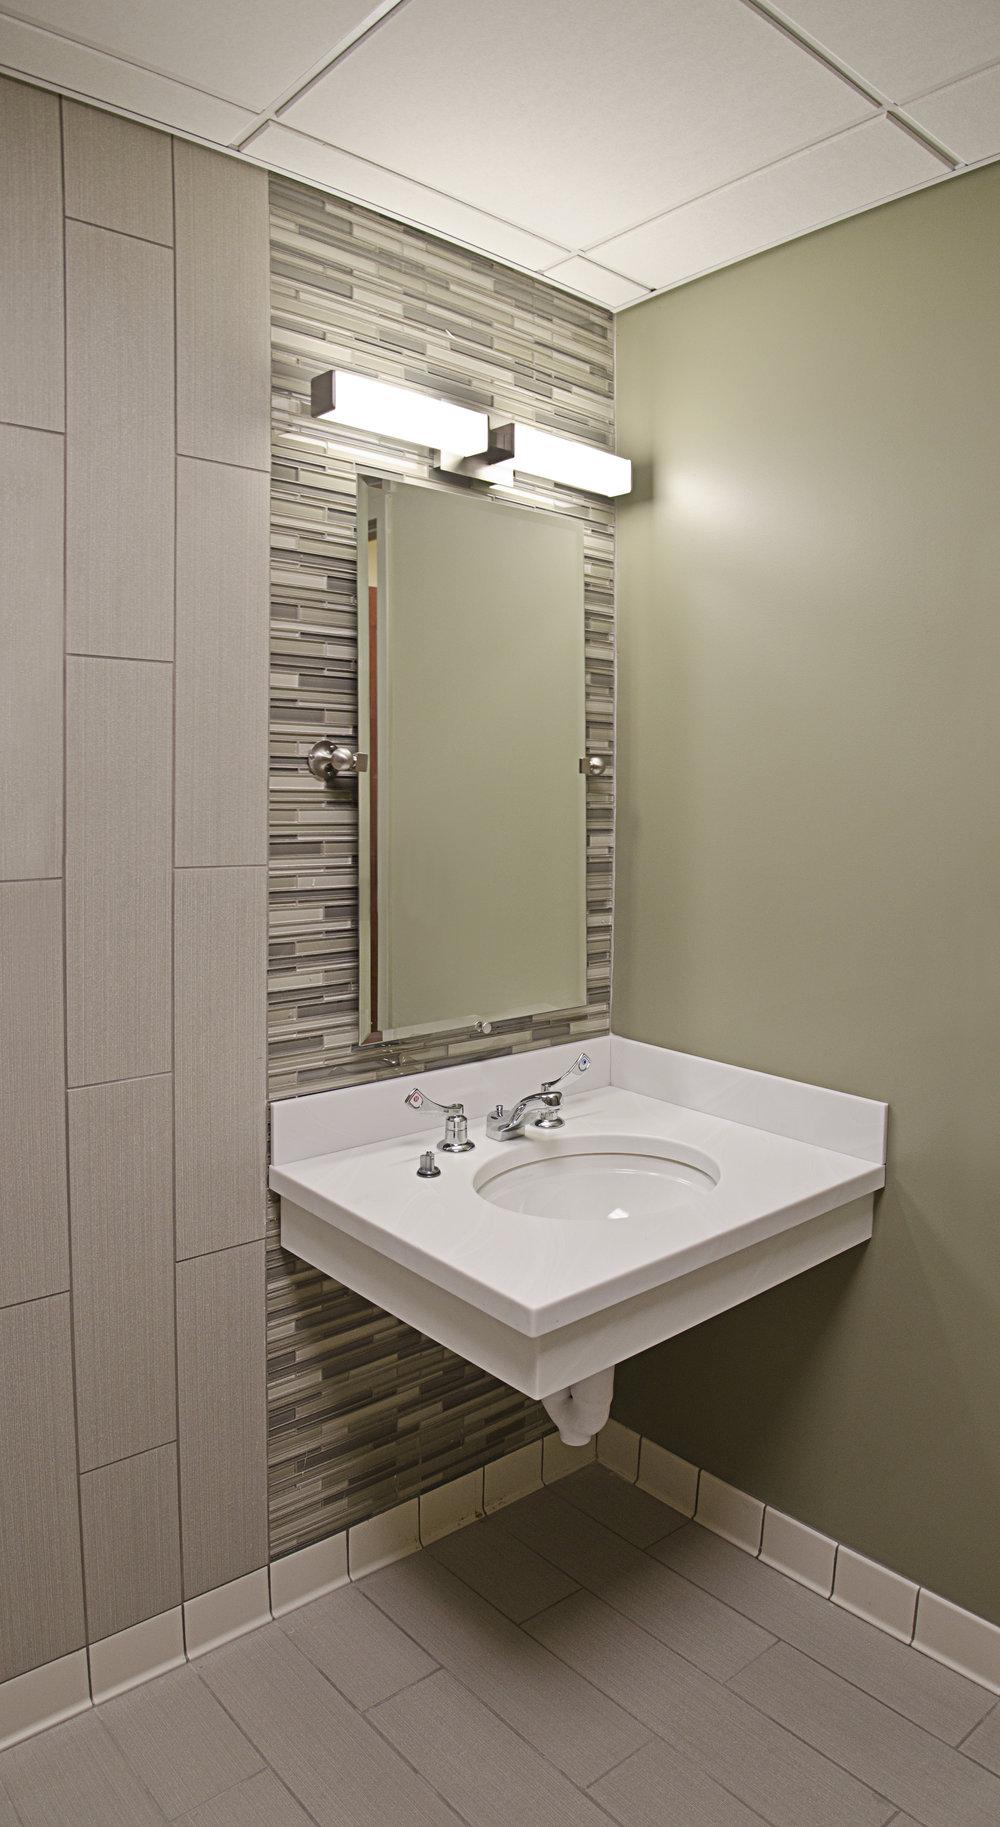 The New Jewish Home. Tobin Parnes Design. NY. Healthcare Design. Bathroom. Sink Area.